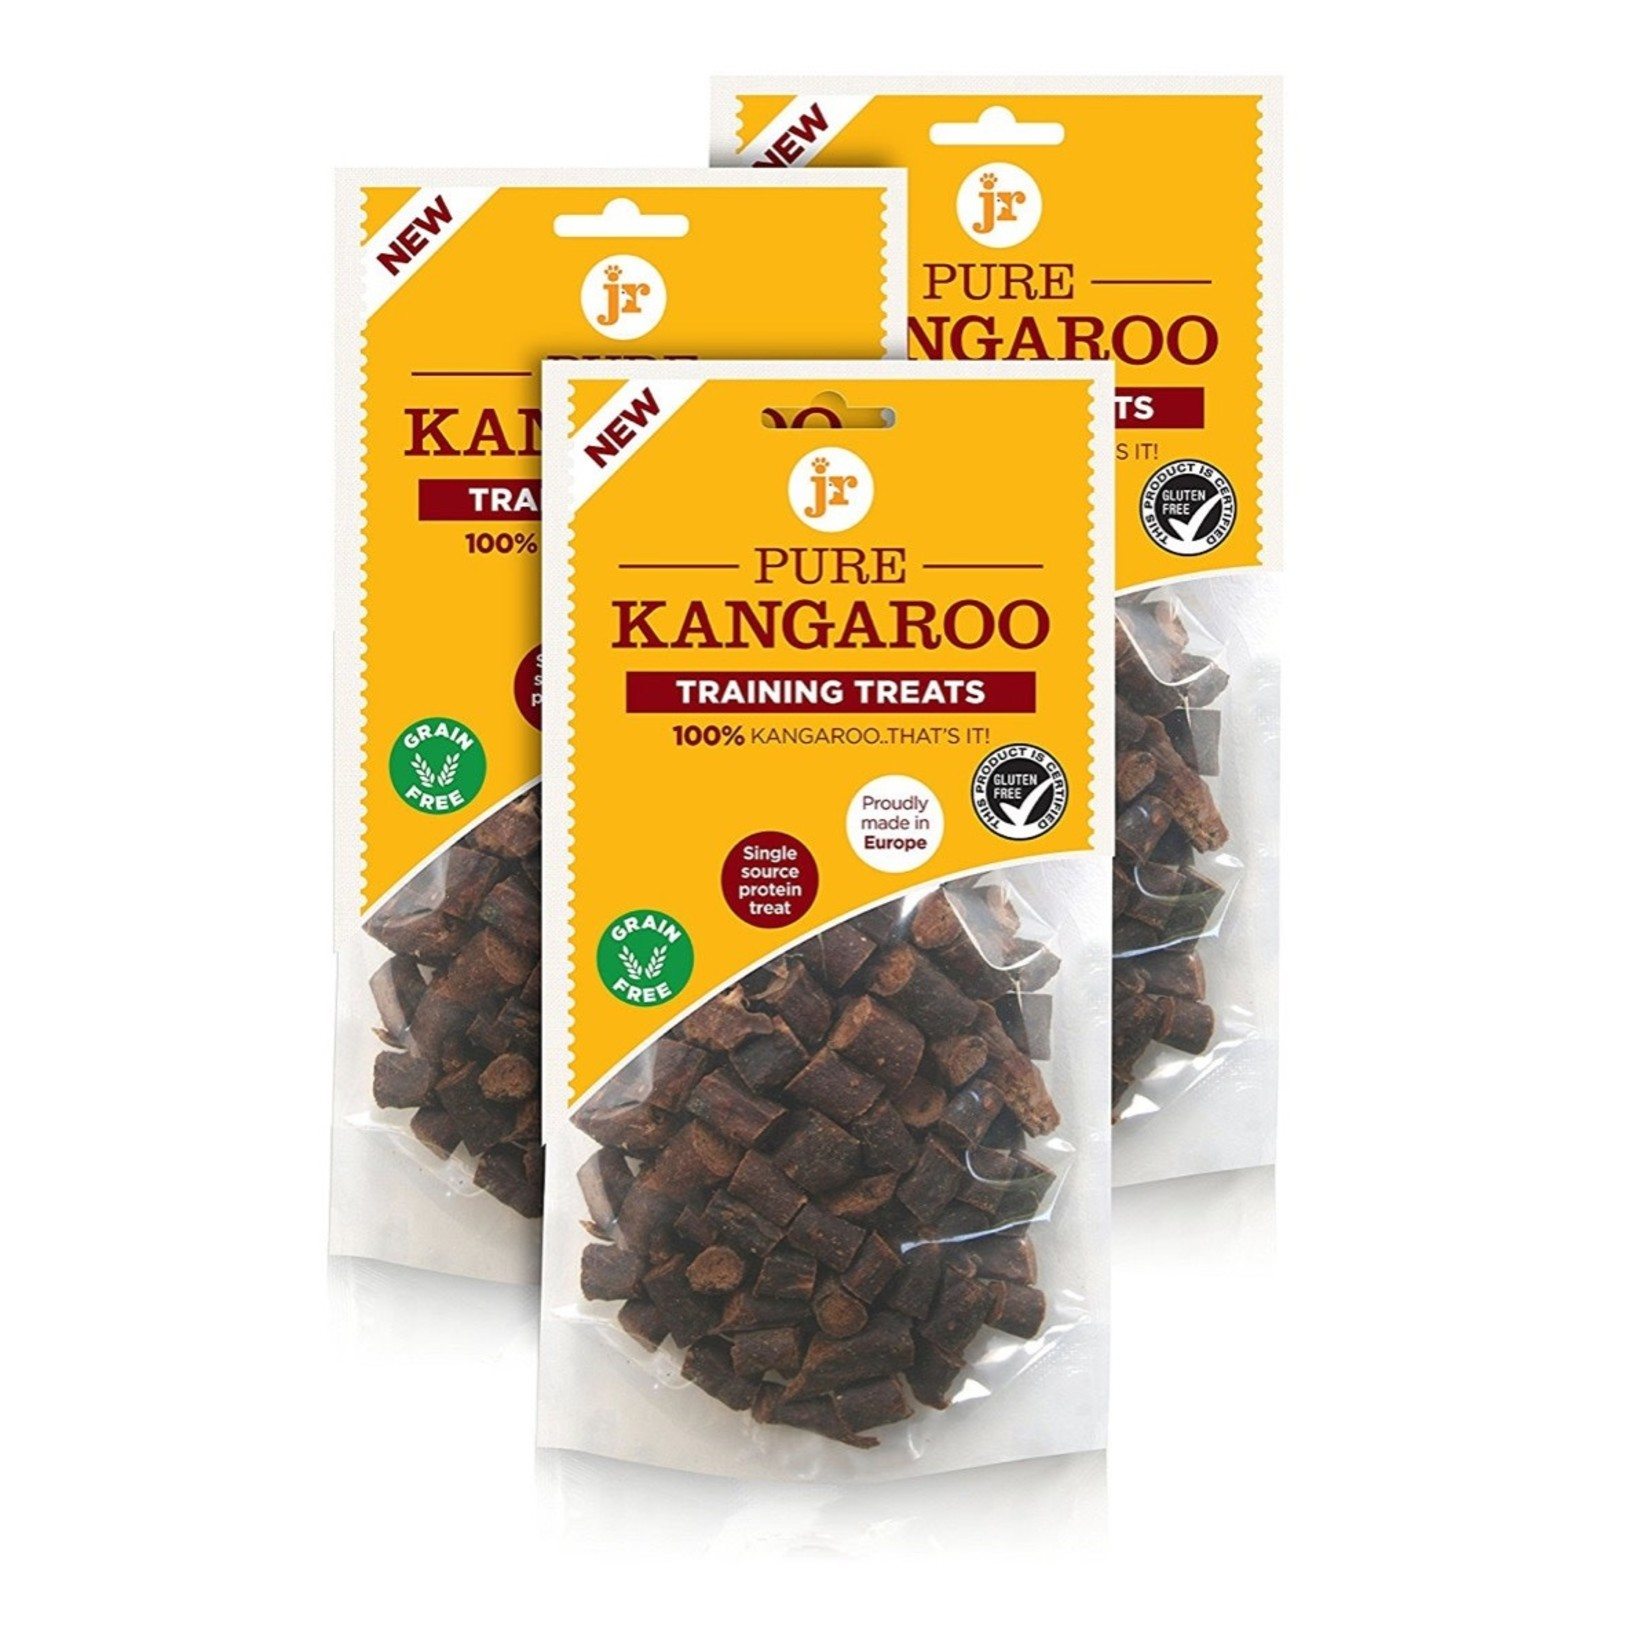 jr pet products Pure Kangaroo Training Dog Treats, 85g